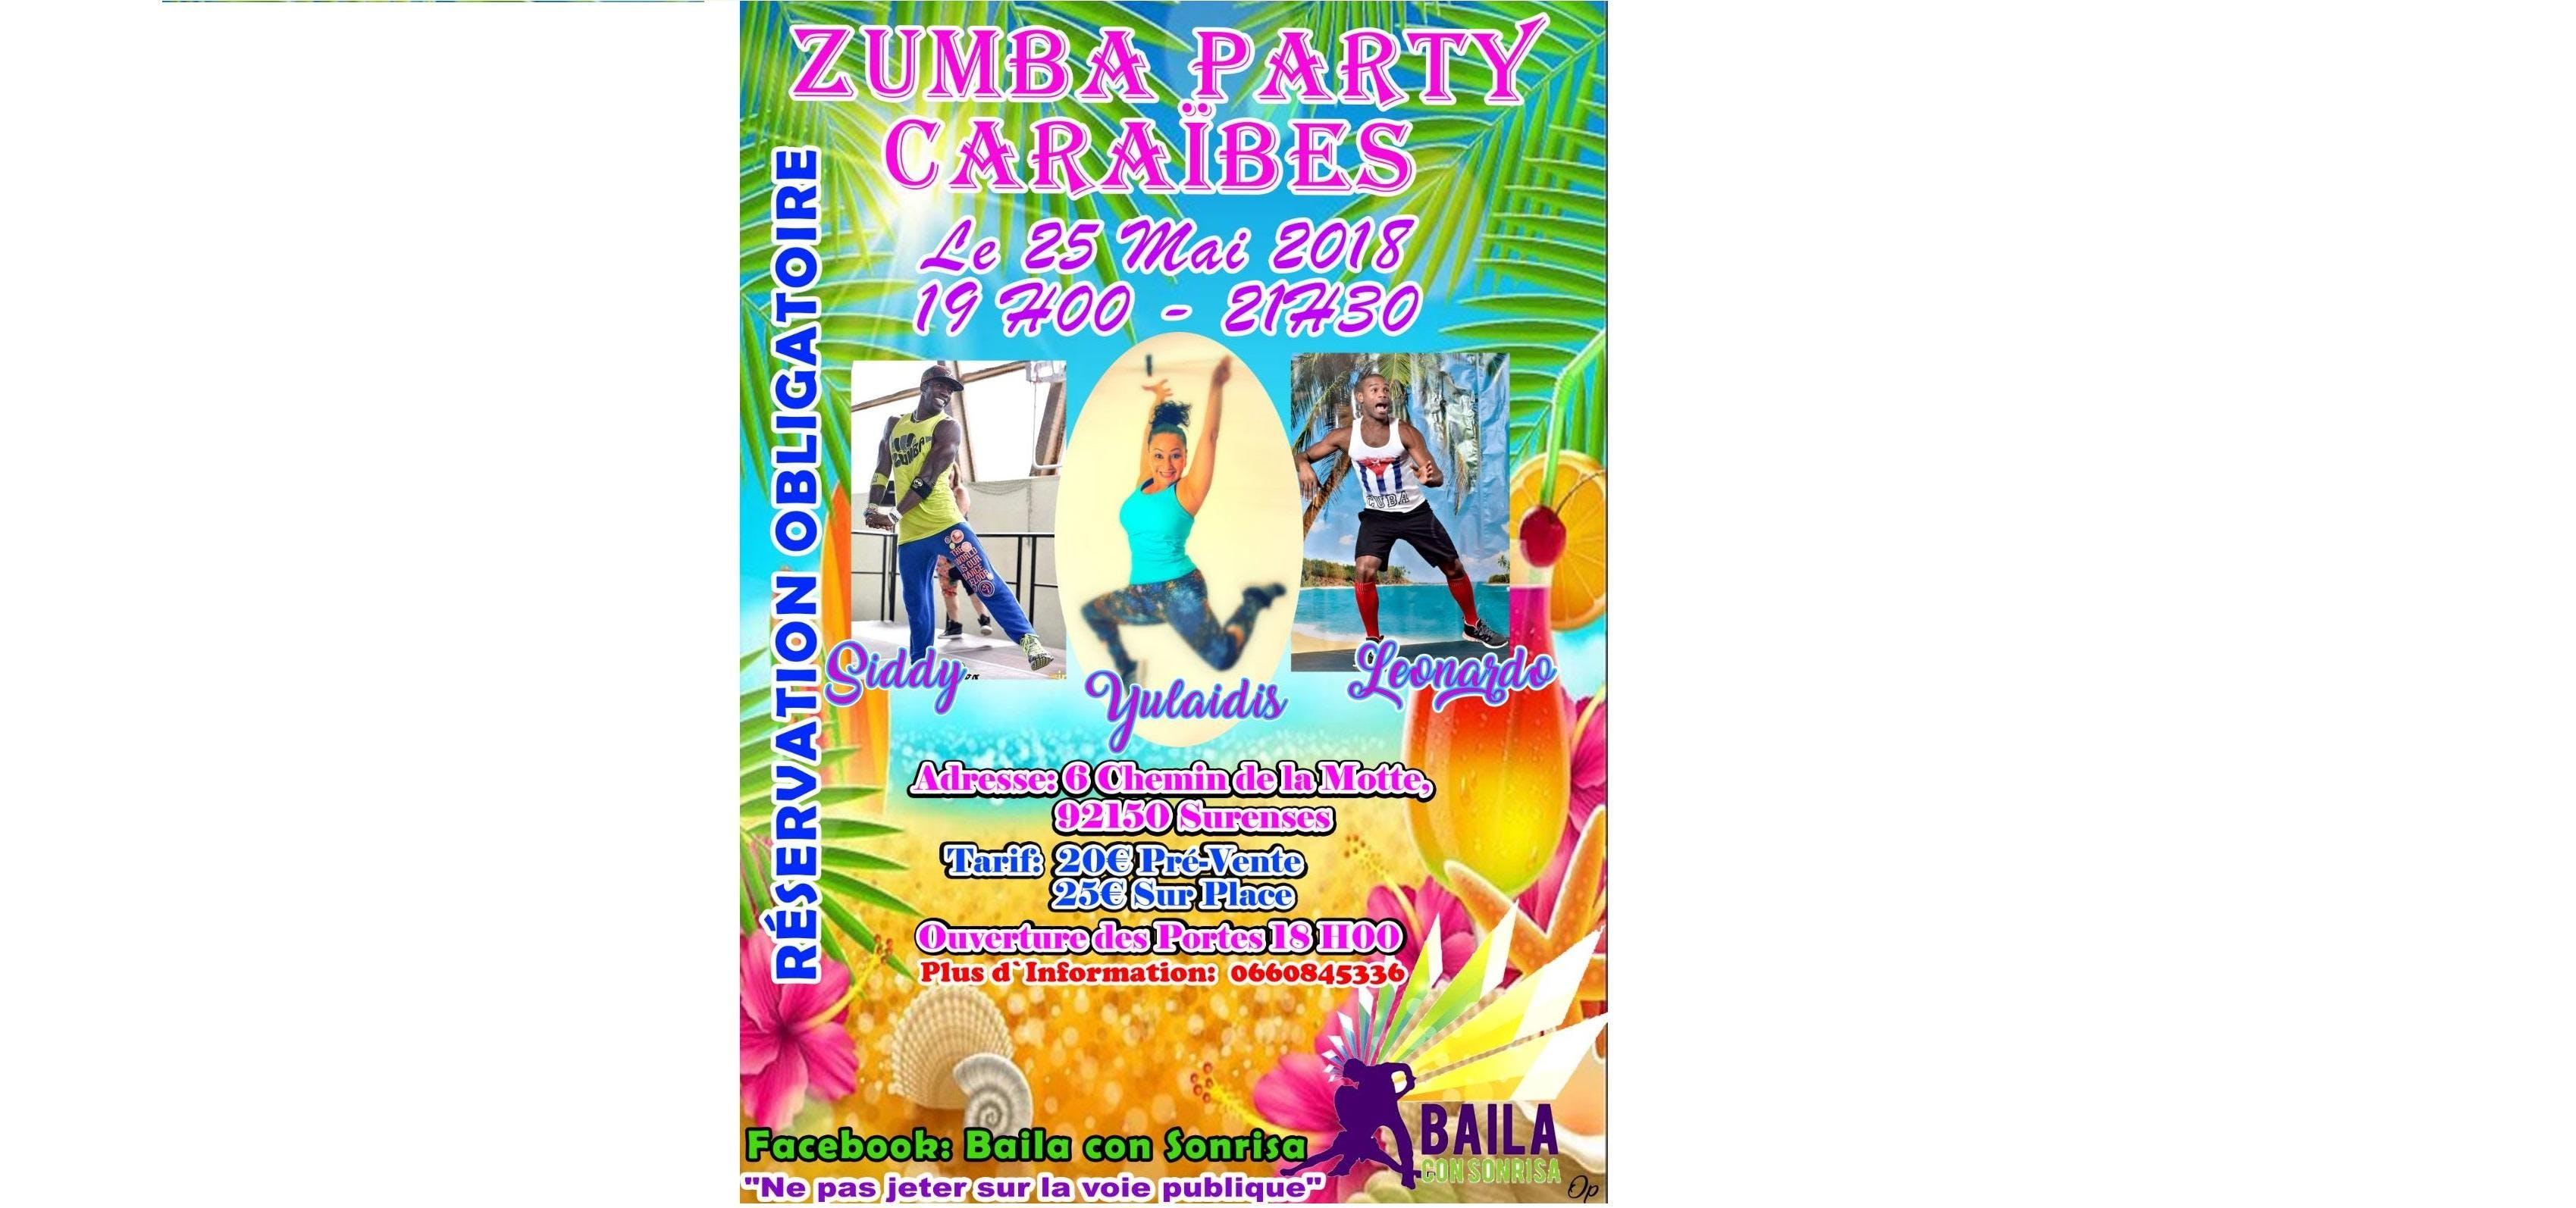 Zumba Party Caraibes